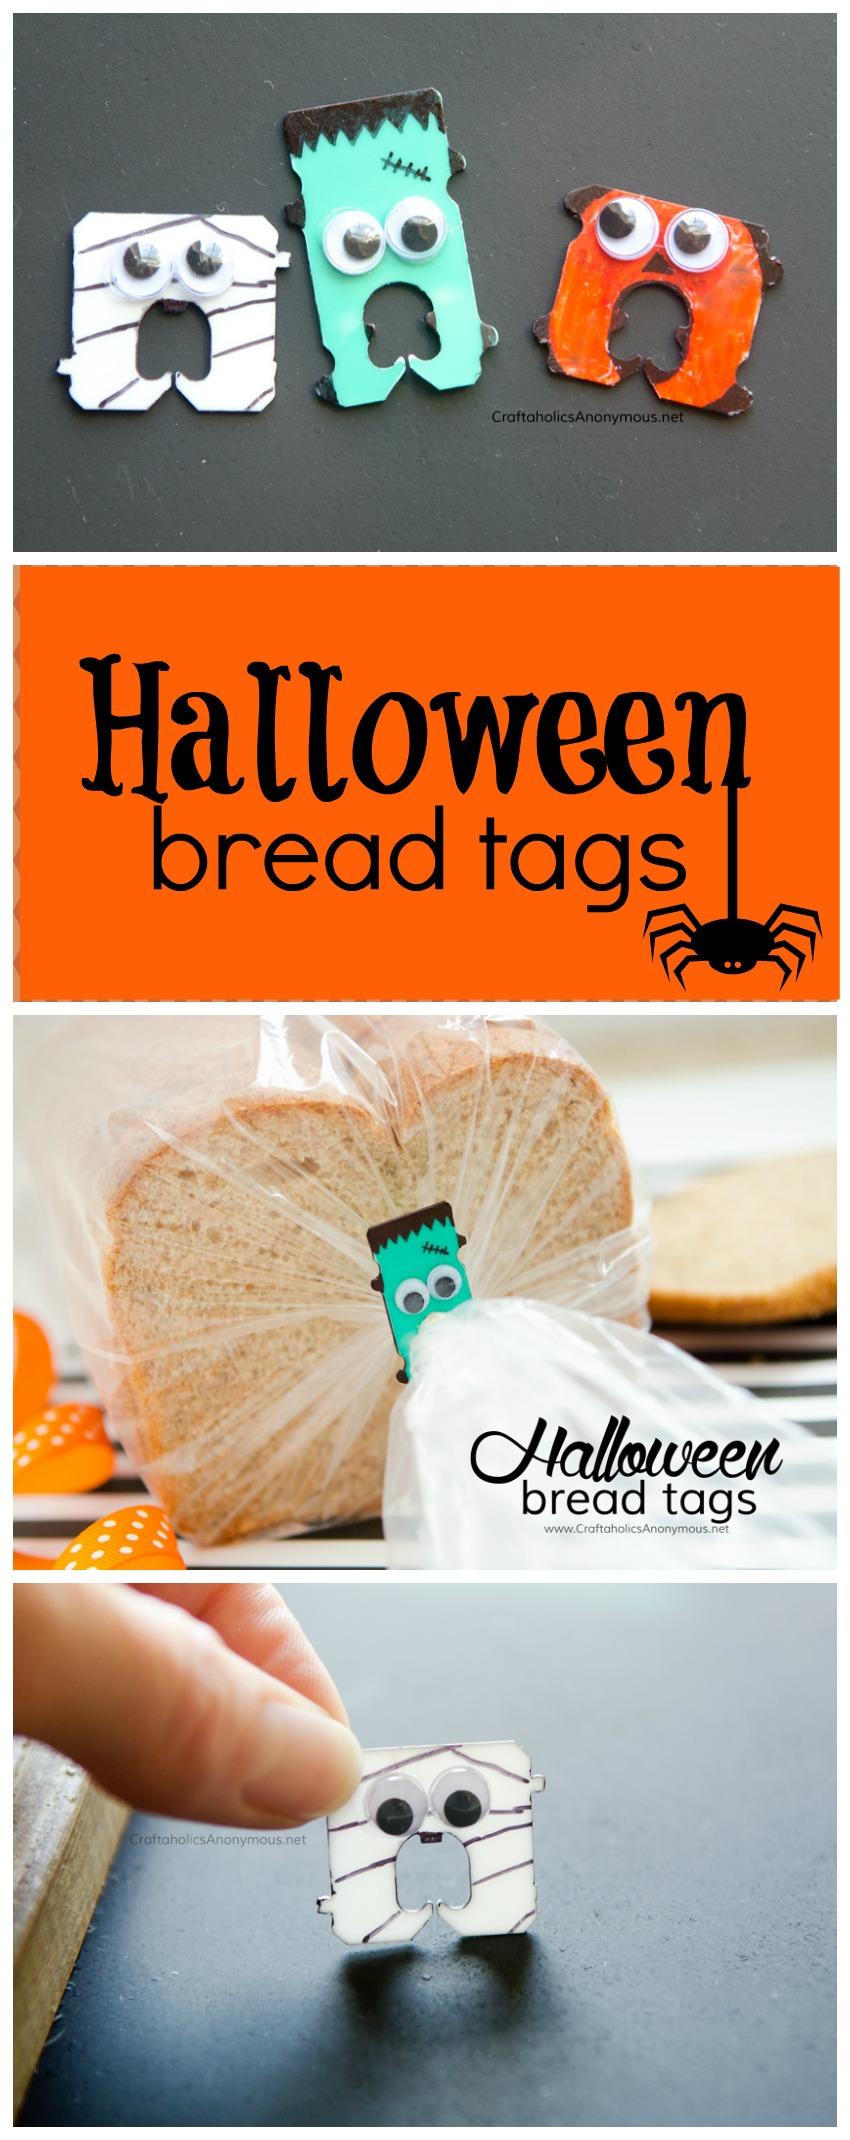 Halloween bread tags || Great Halloween craft for kids + reuse bread tabs